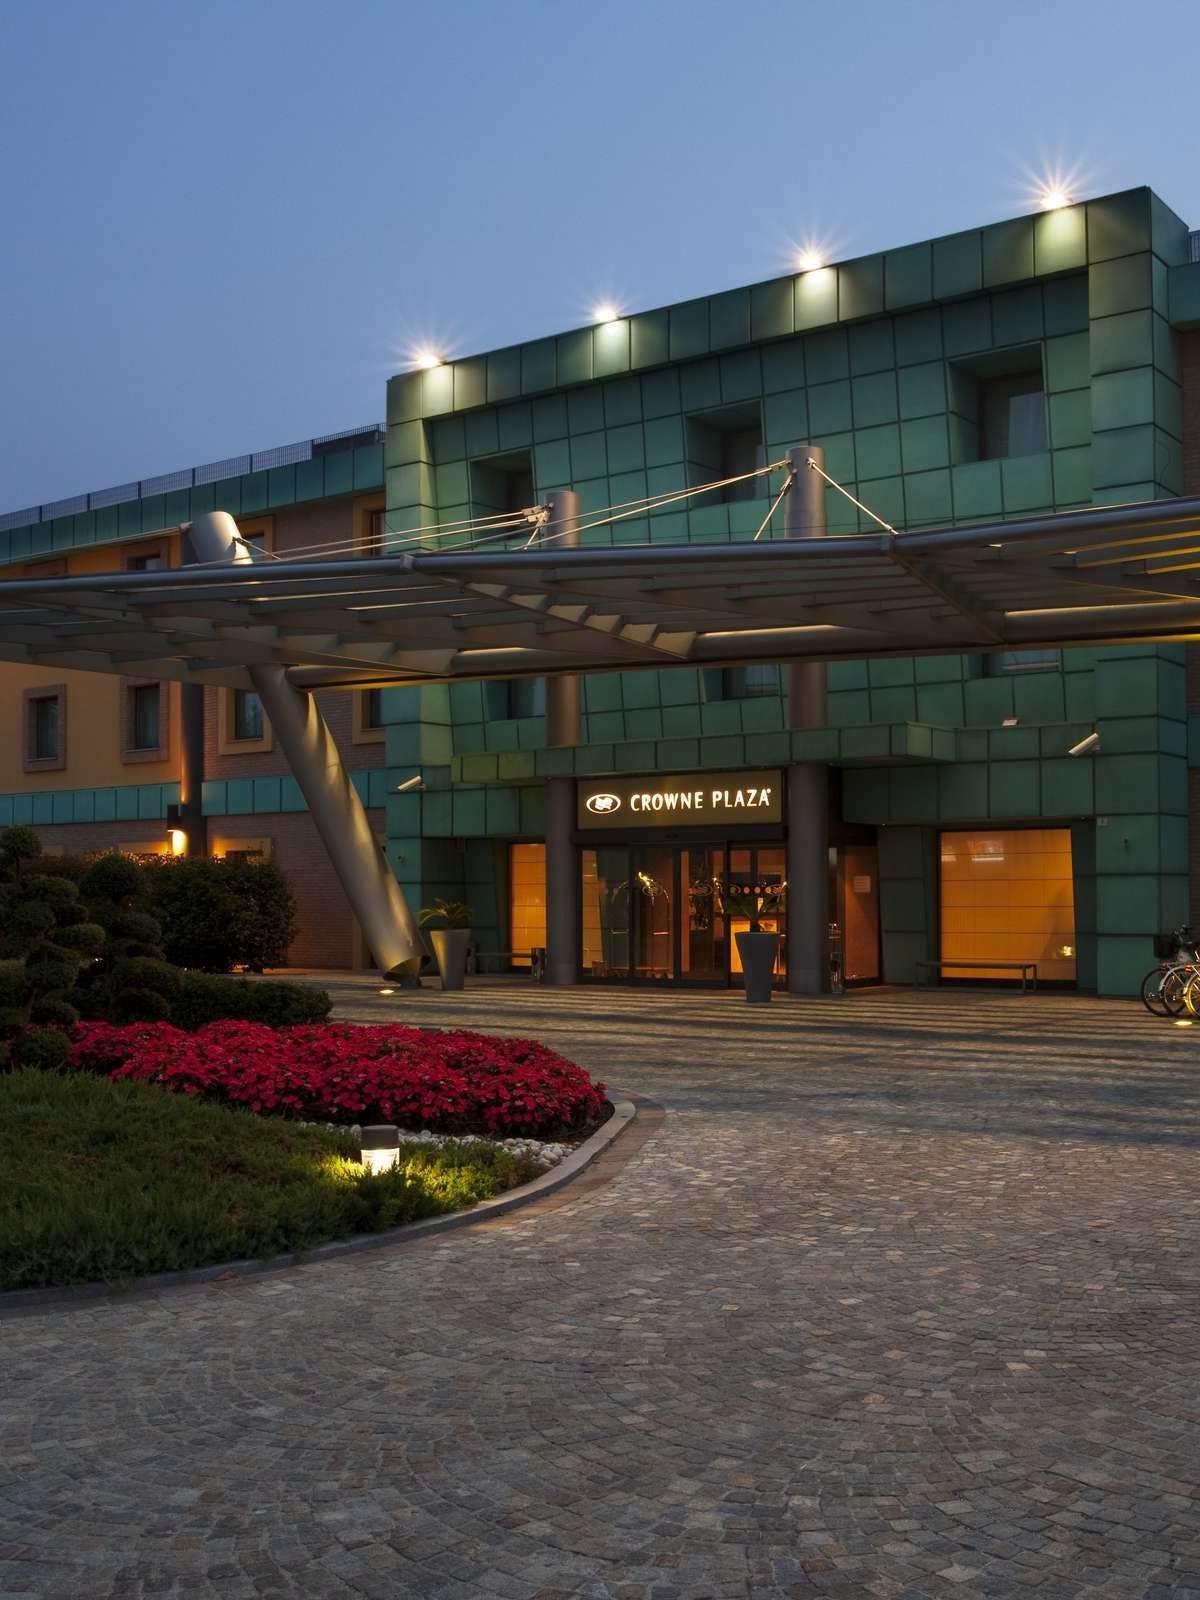 Crowne Plaza Milan Malpensa Airport